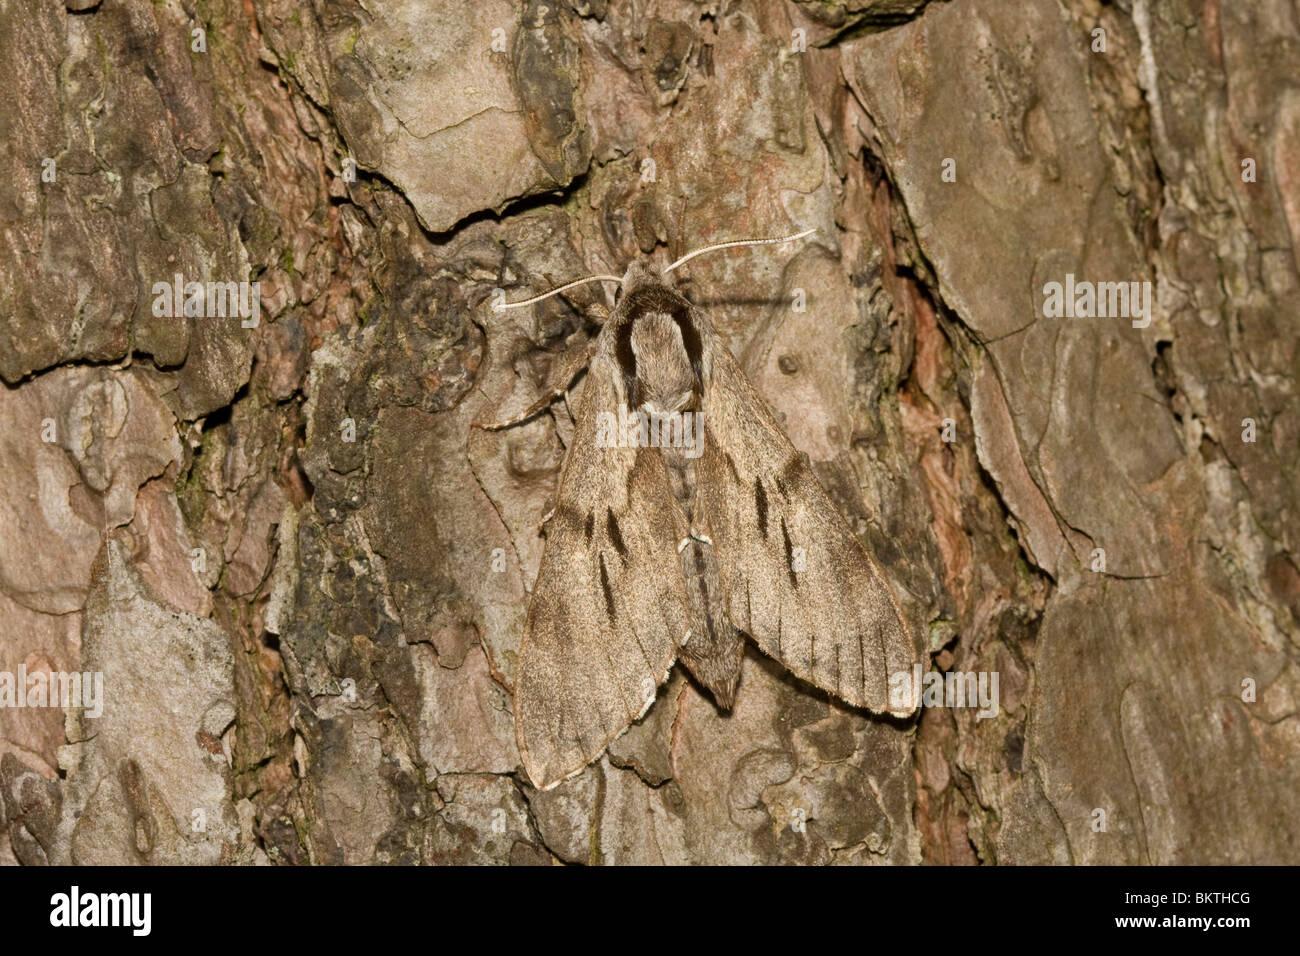 Dennenpijlstaart; Pine Hawk-moth - Stock Image